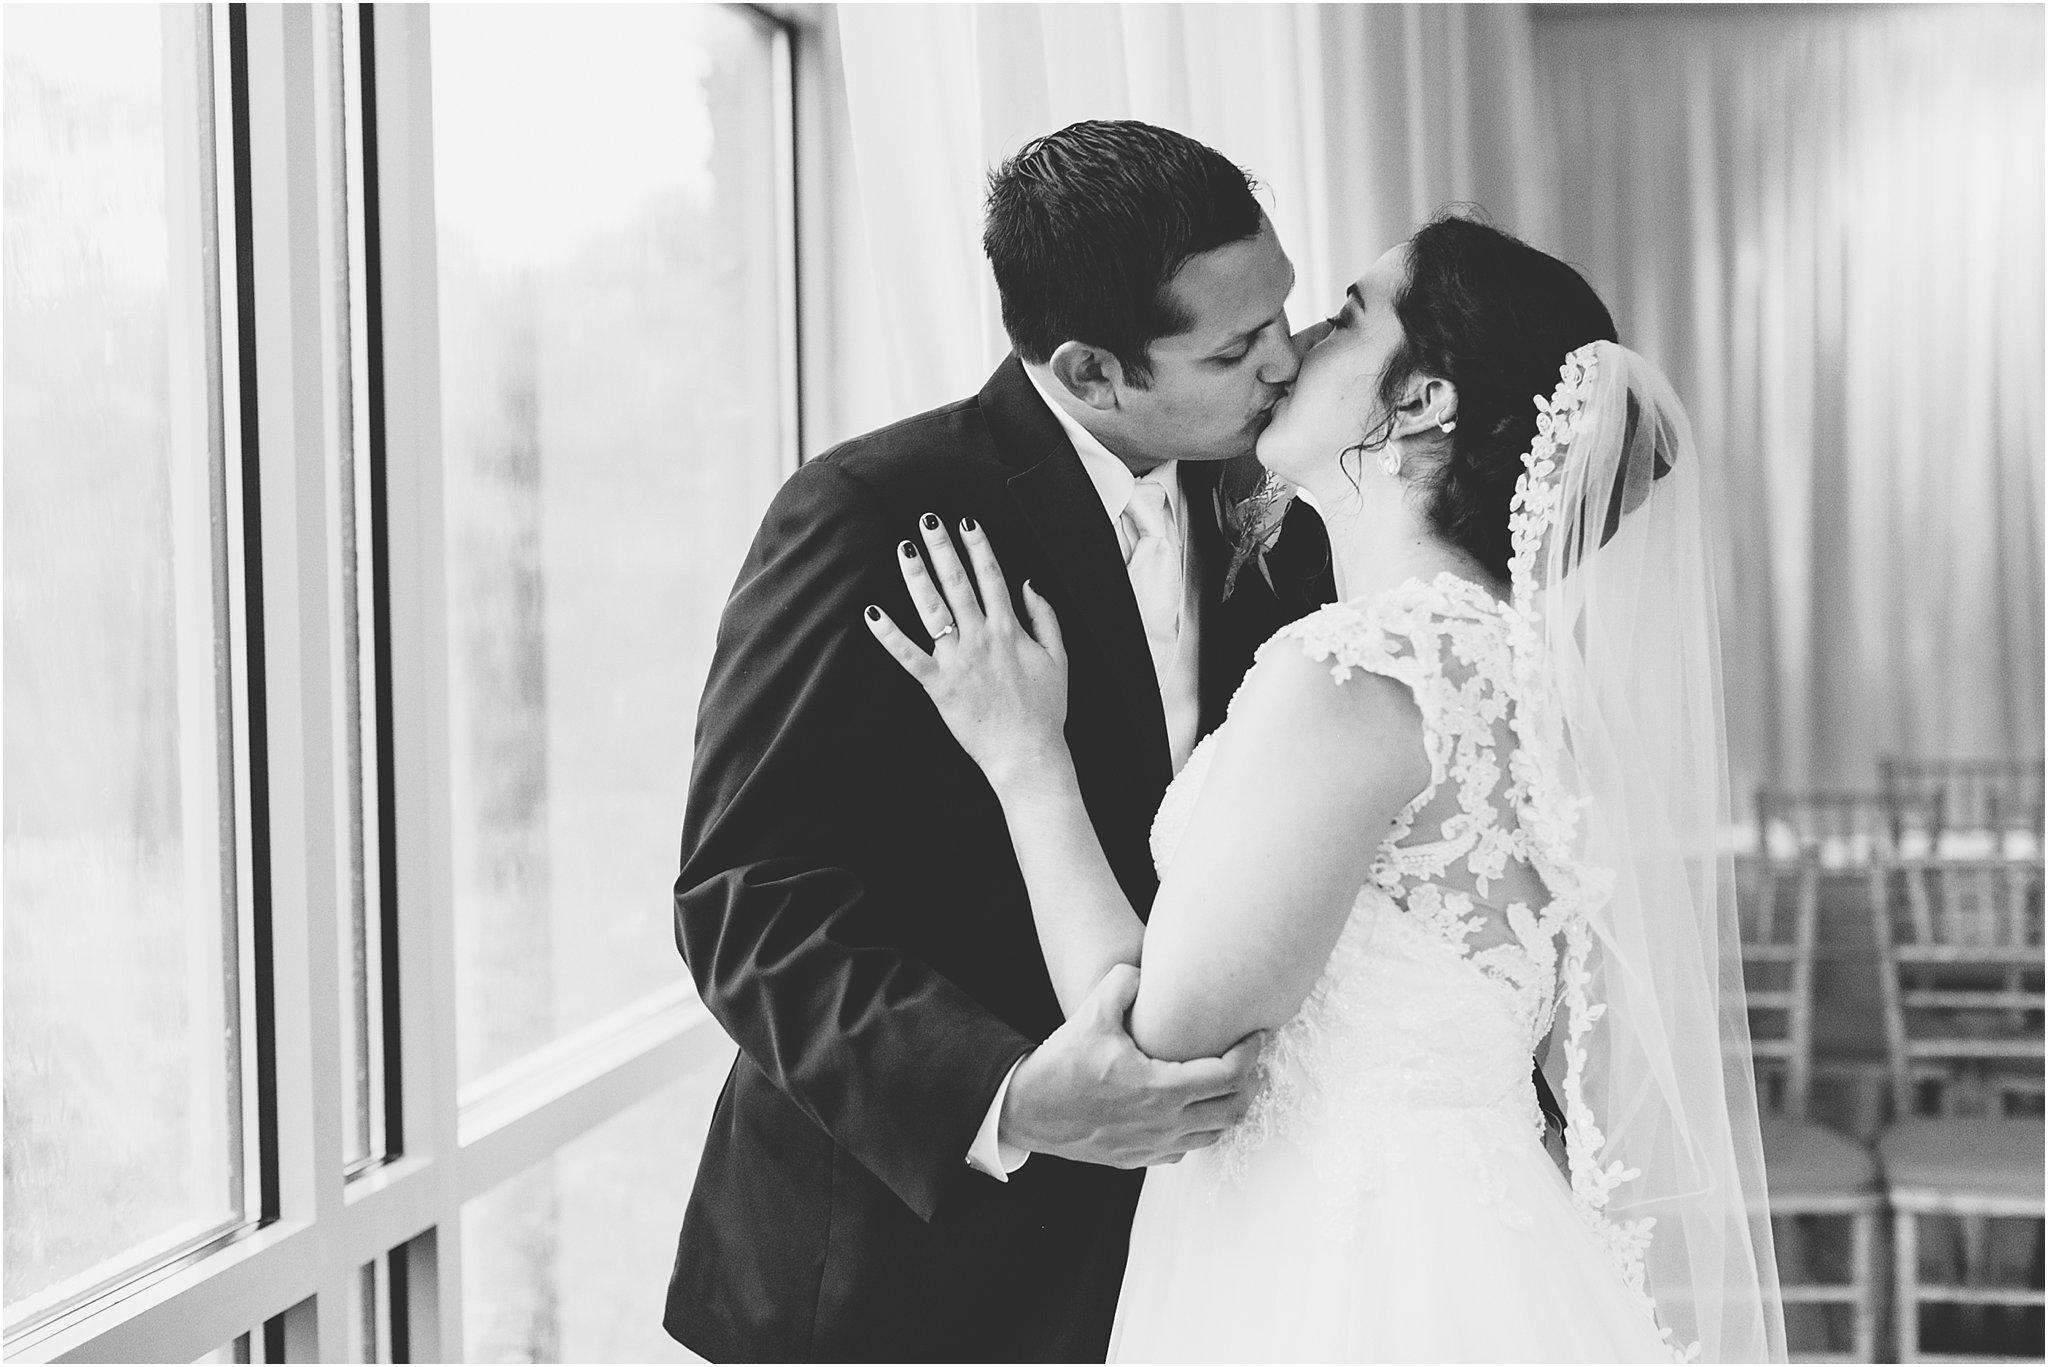 jessica_ryan_photography_virginia_wedding_photographer_wedding_hurricane_norfolk_botanical_gardens_hurricane_matthew_wedding_3568